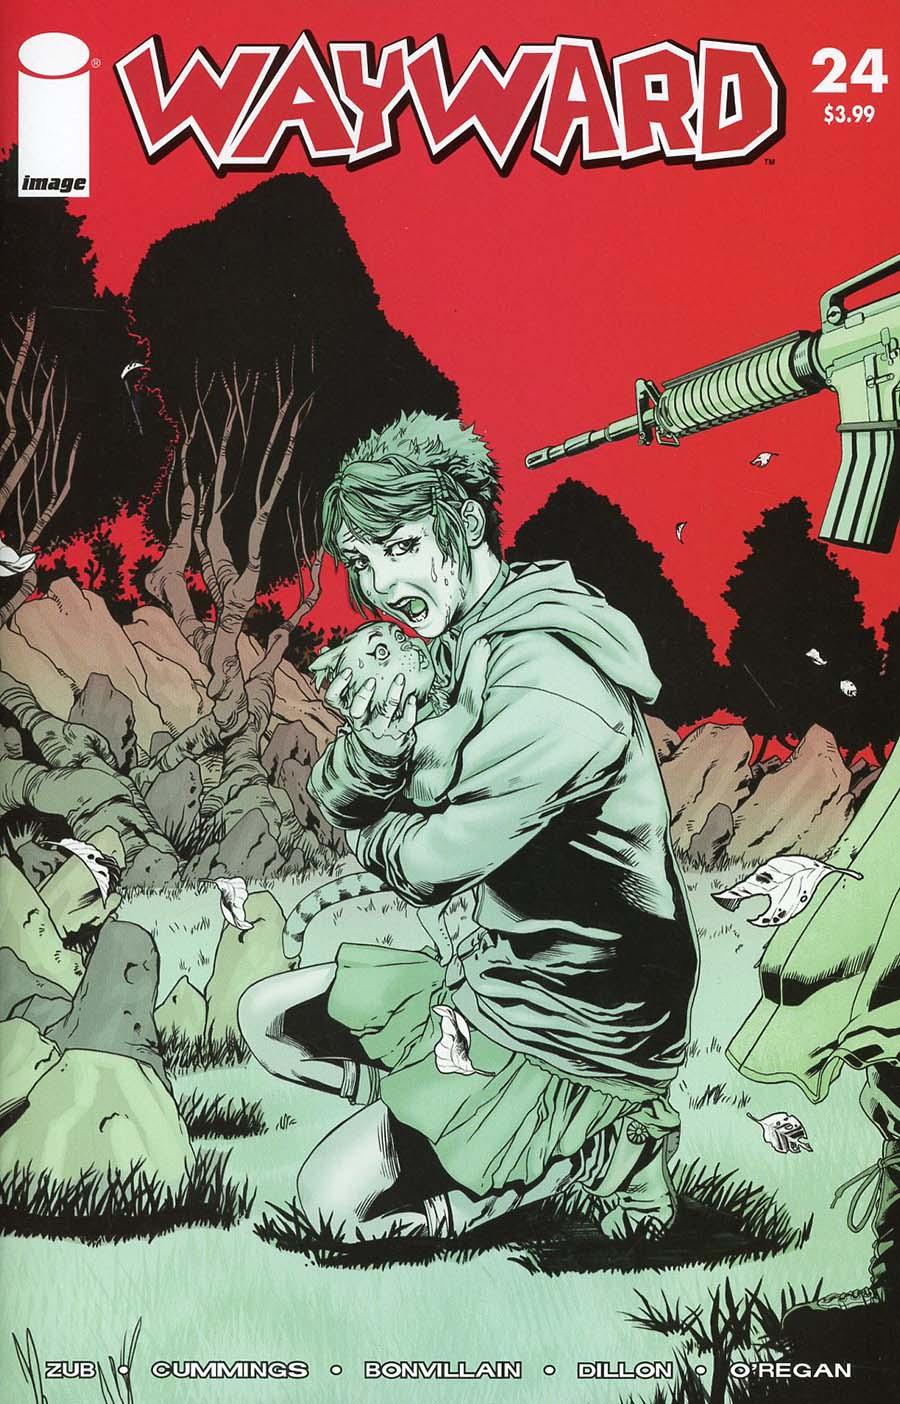 Wayward #24 Cover C Variant Steven Cummings & Royce Fooray Southerland Walking Dead 47 Tribute Color Cover